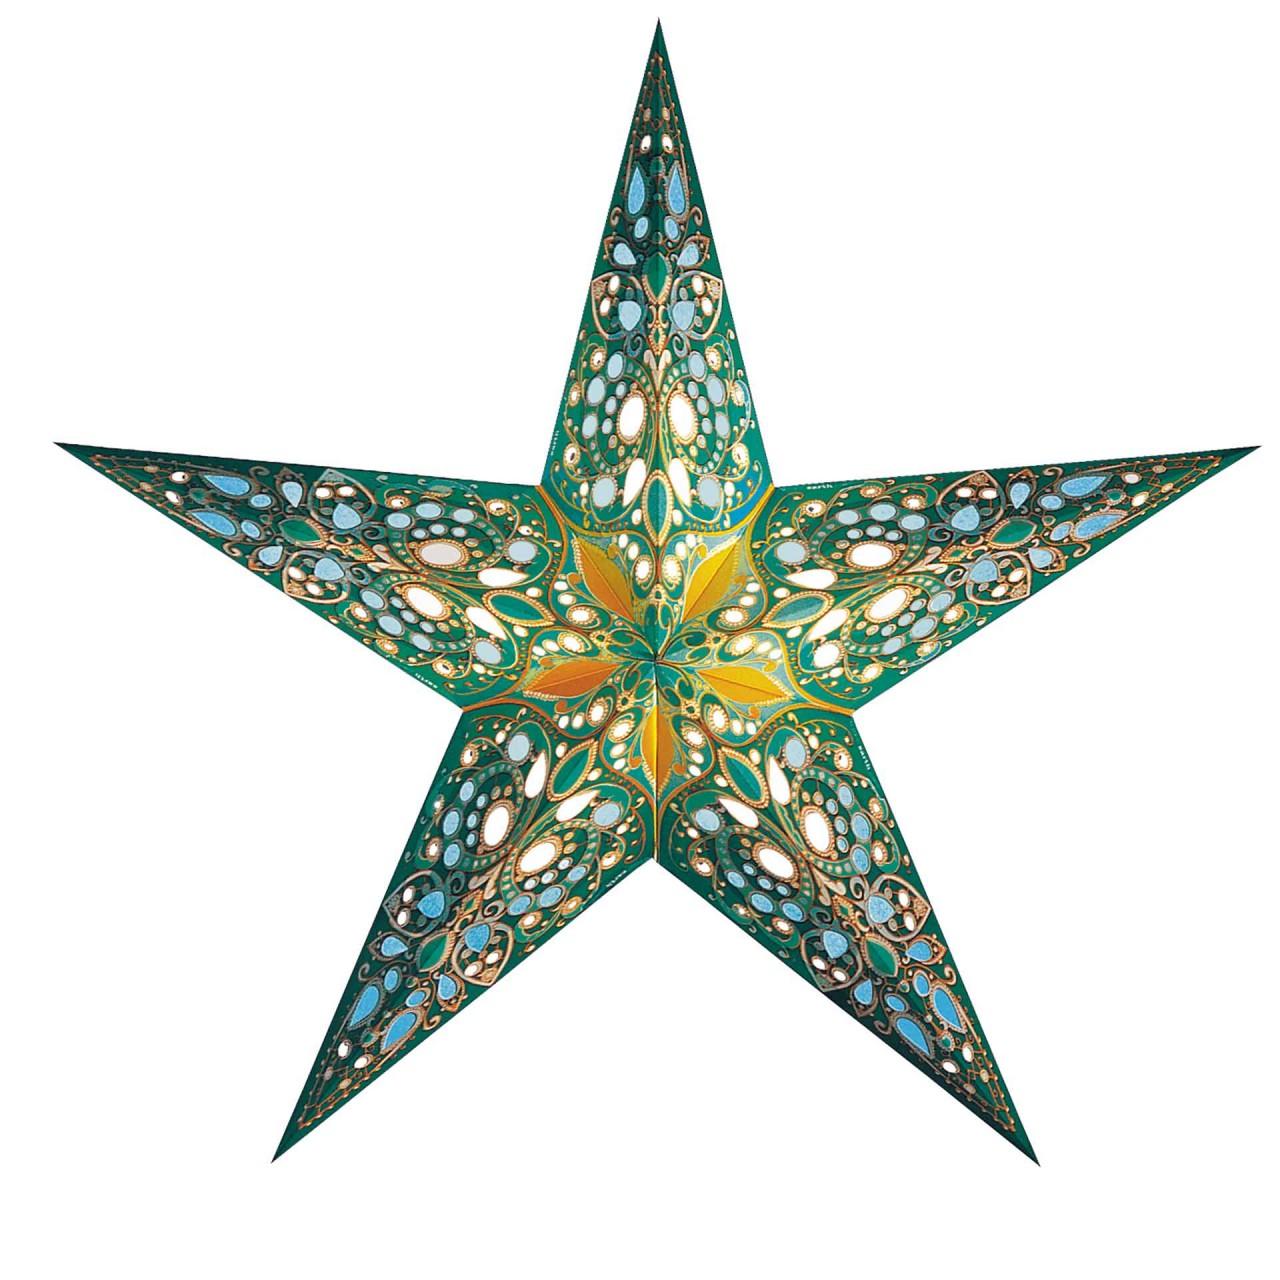 starlightz monsoon - size M